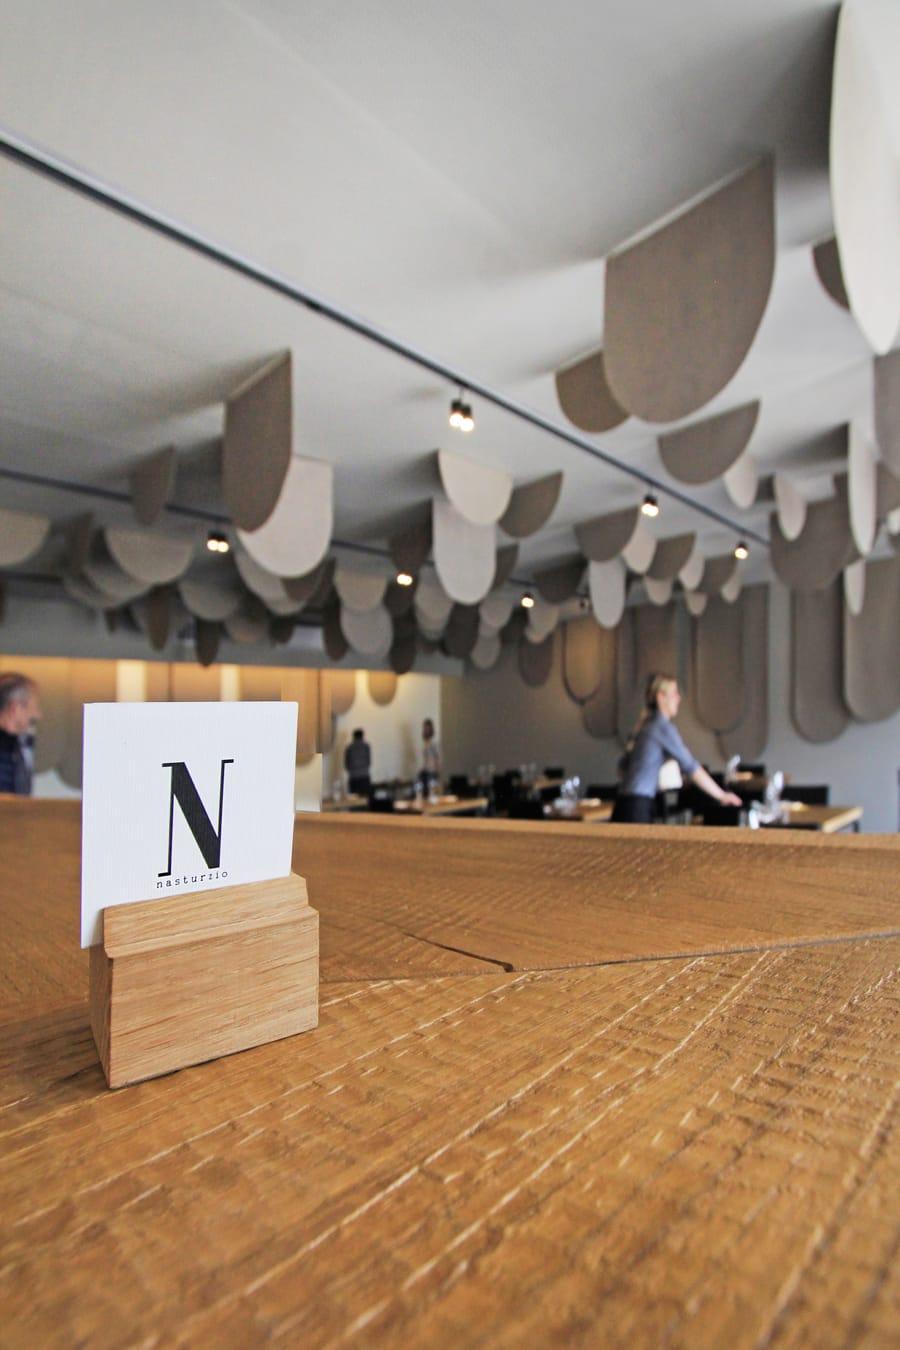 8_Francesca Perani and Arianna Foresti_Nasturzio Restaurant_Inspirationist